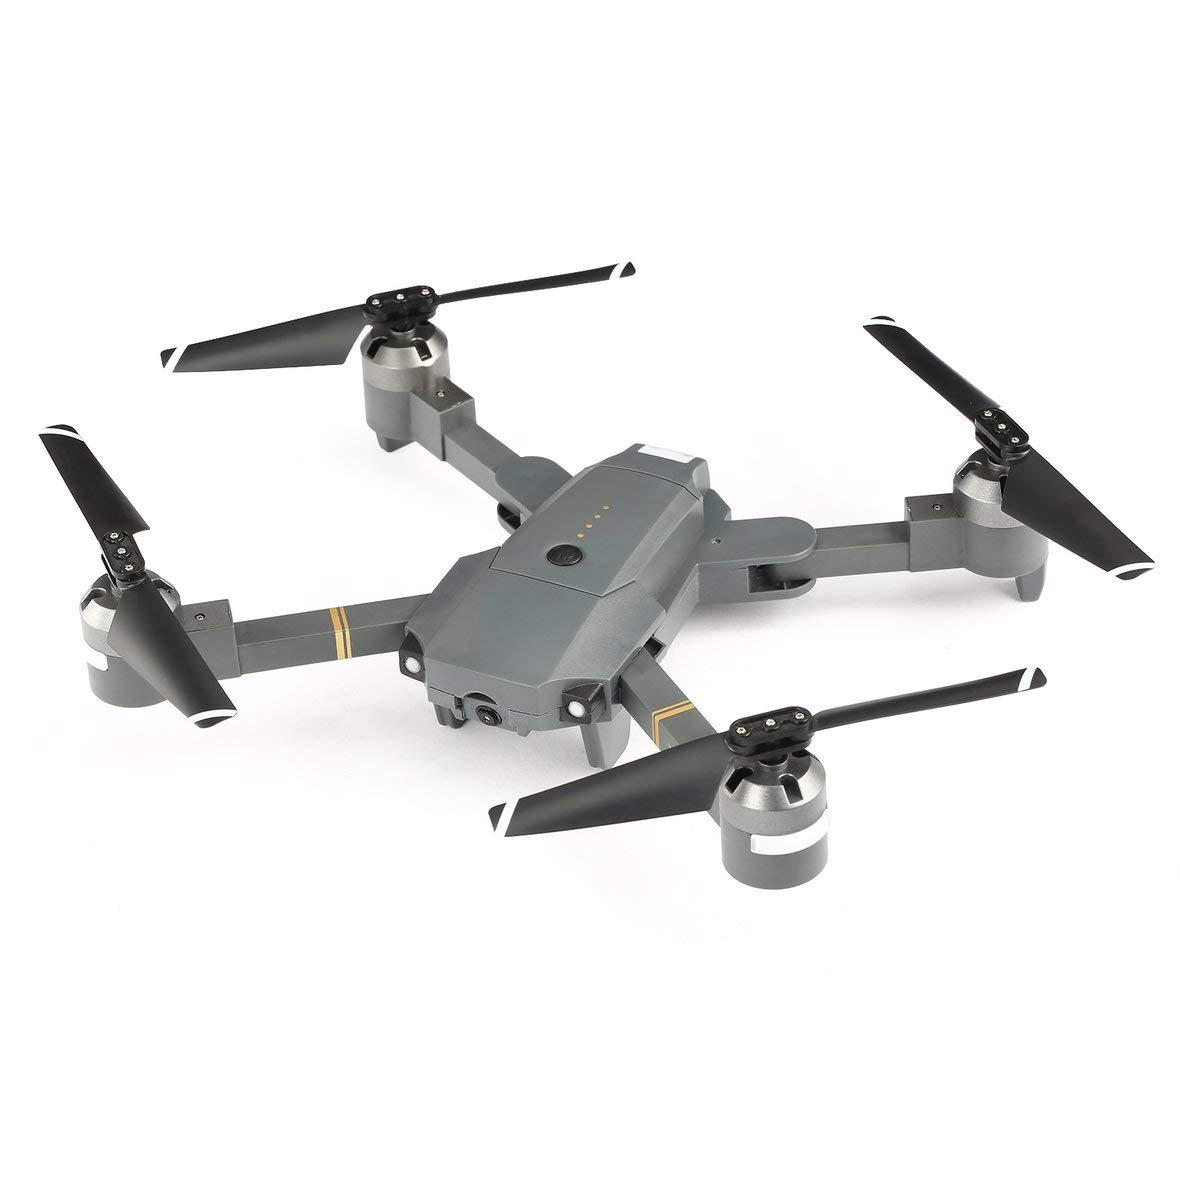 ToGames Attop XT-1 WiFi 2,4G FPV 3D-Kamera Drone Flip Höhe halten Faltbare One-Key-Start / Headless Landung Modus RC Quadcopter